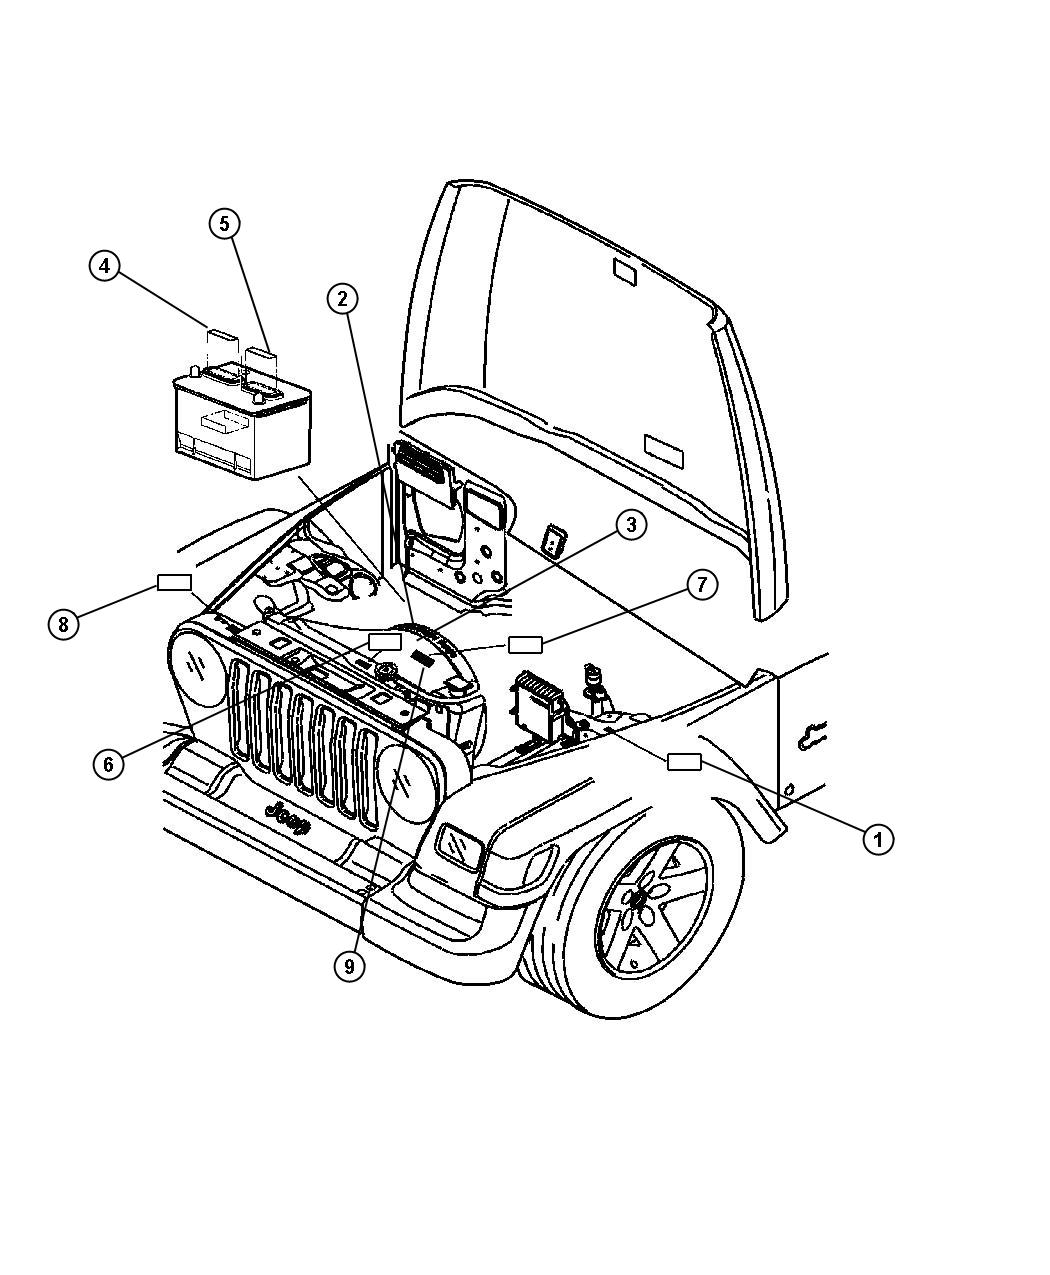 Jeep Wrangler Label Refrigerant